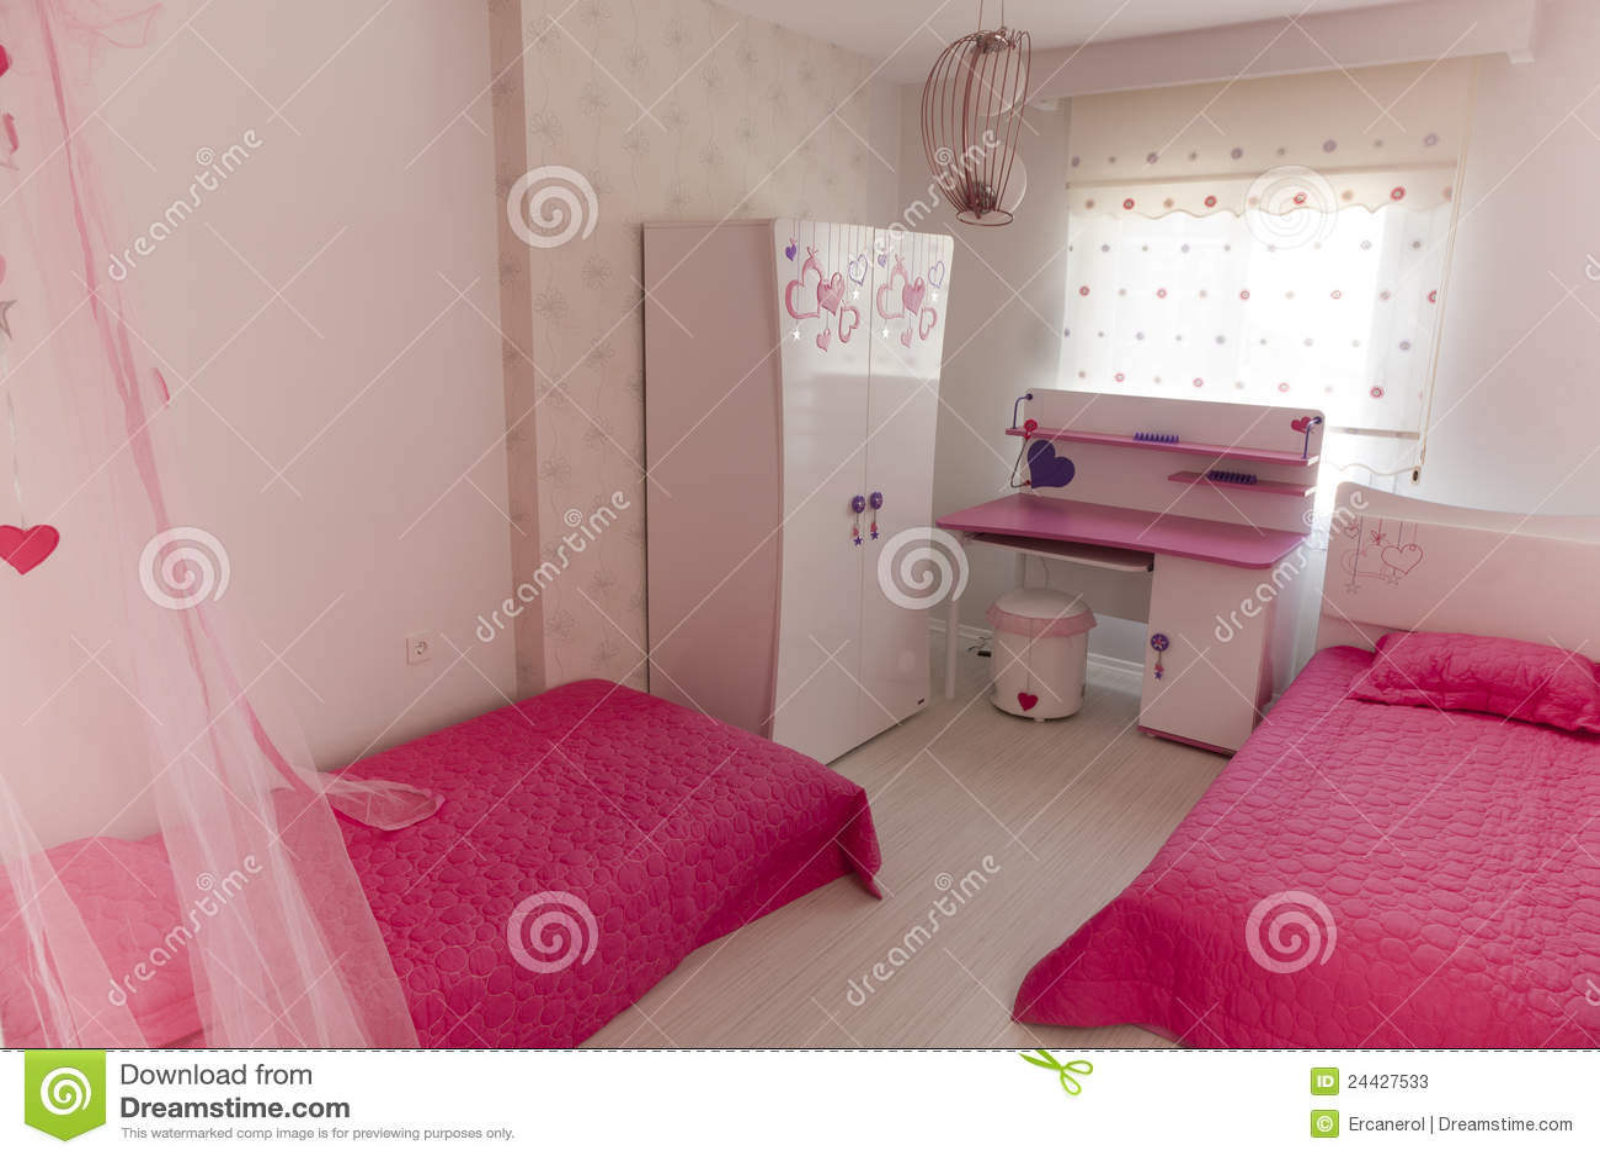 Roze slaapkamer bedden en bureau stock foto 39 s afbeelding 24427533 - Deco meisjes slaapkamer ...